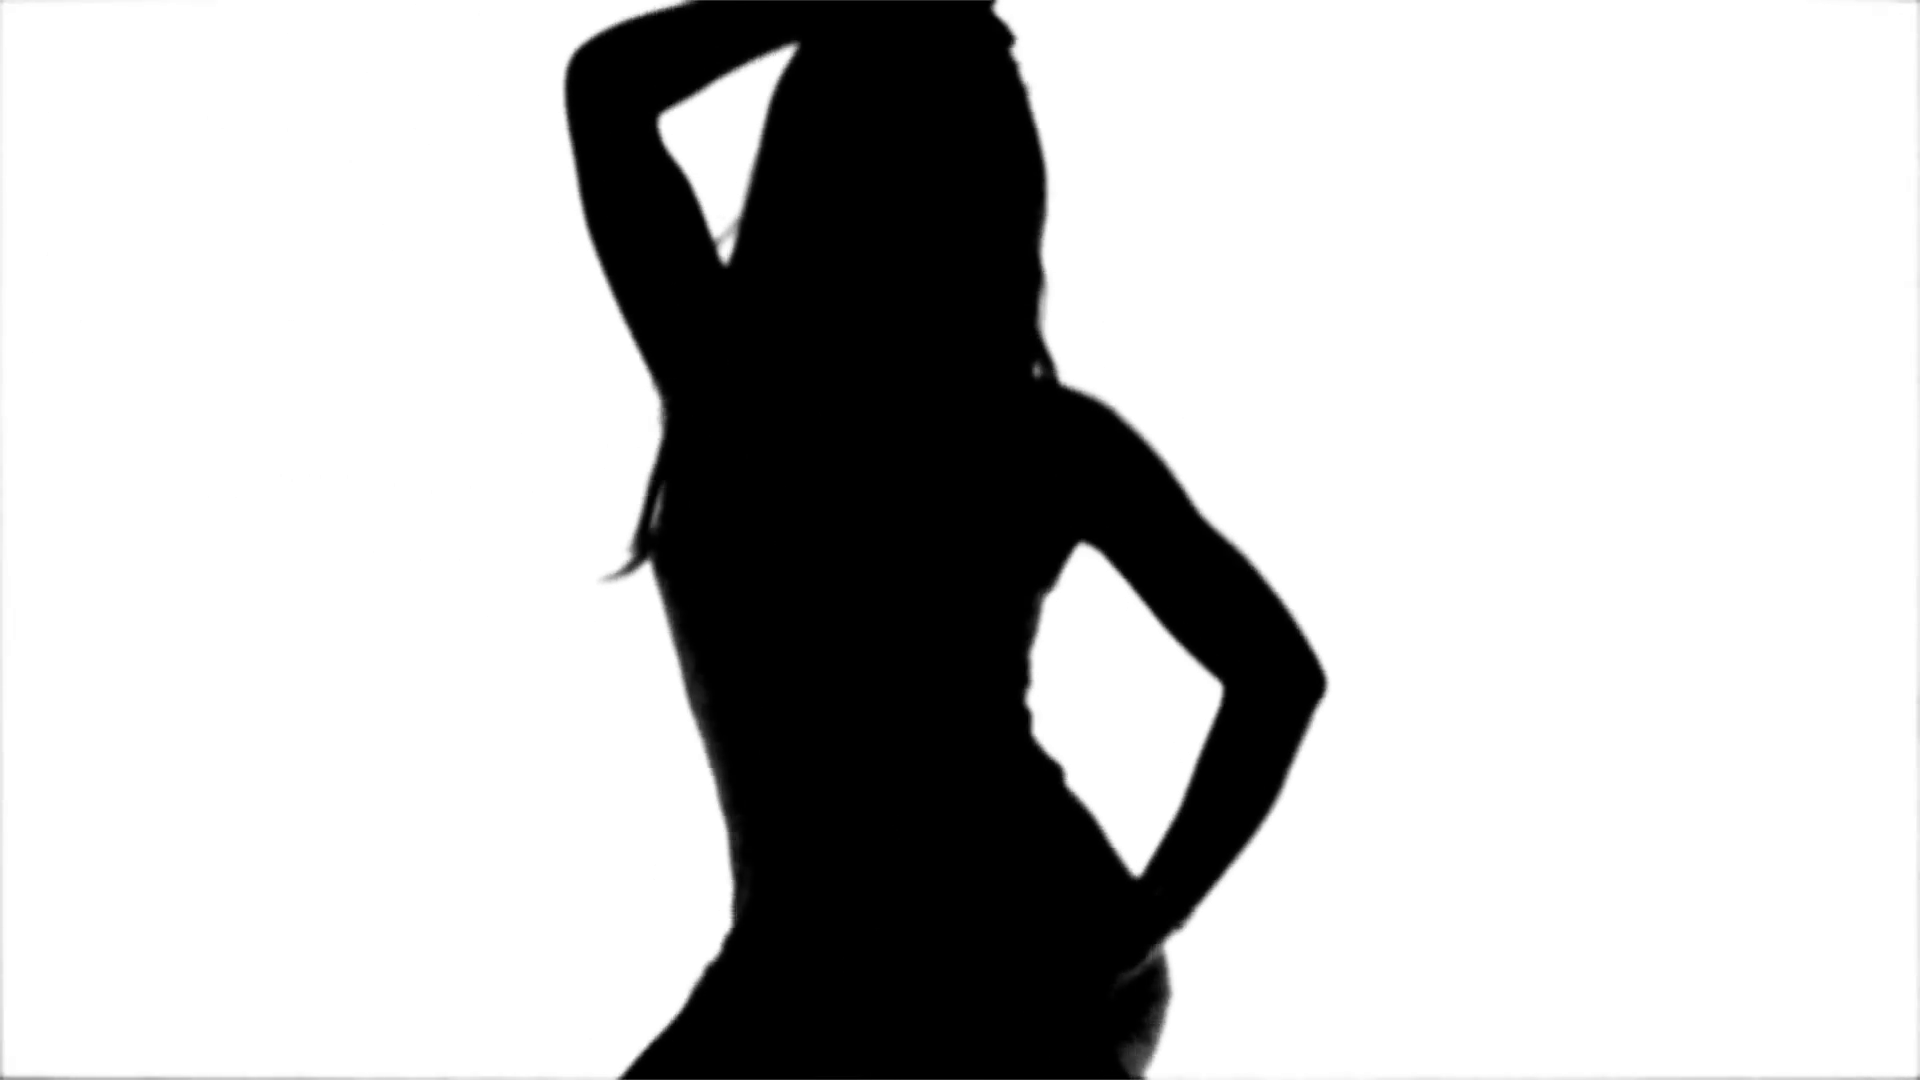 1920x1080 Lap Dance Silhouette